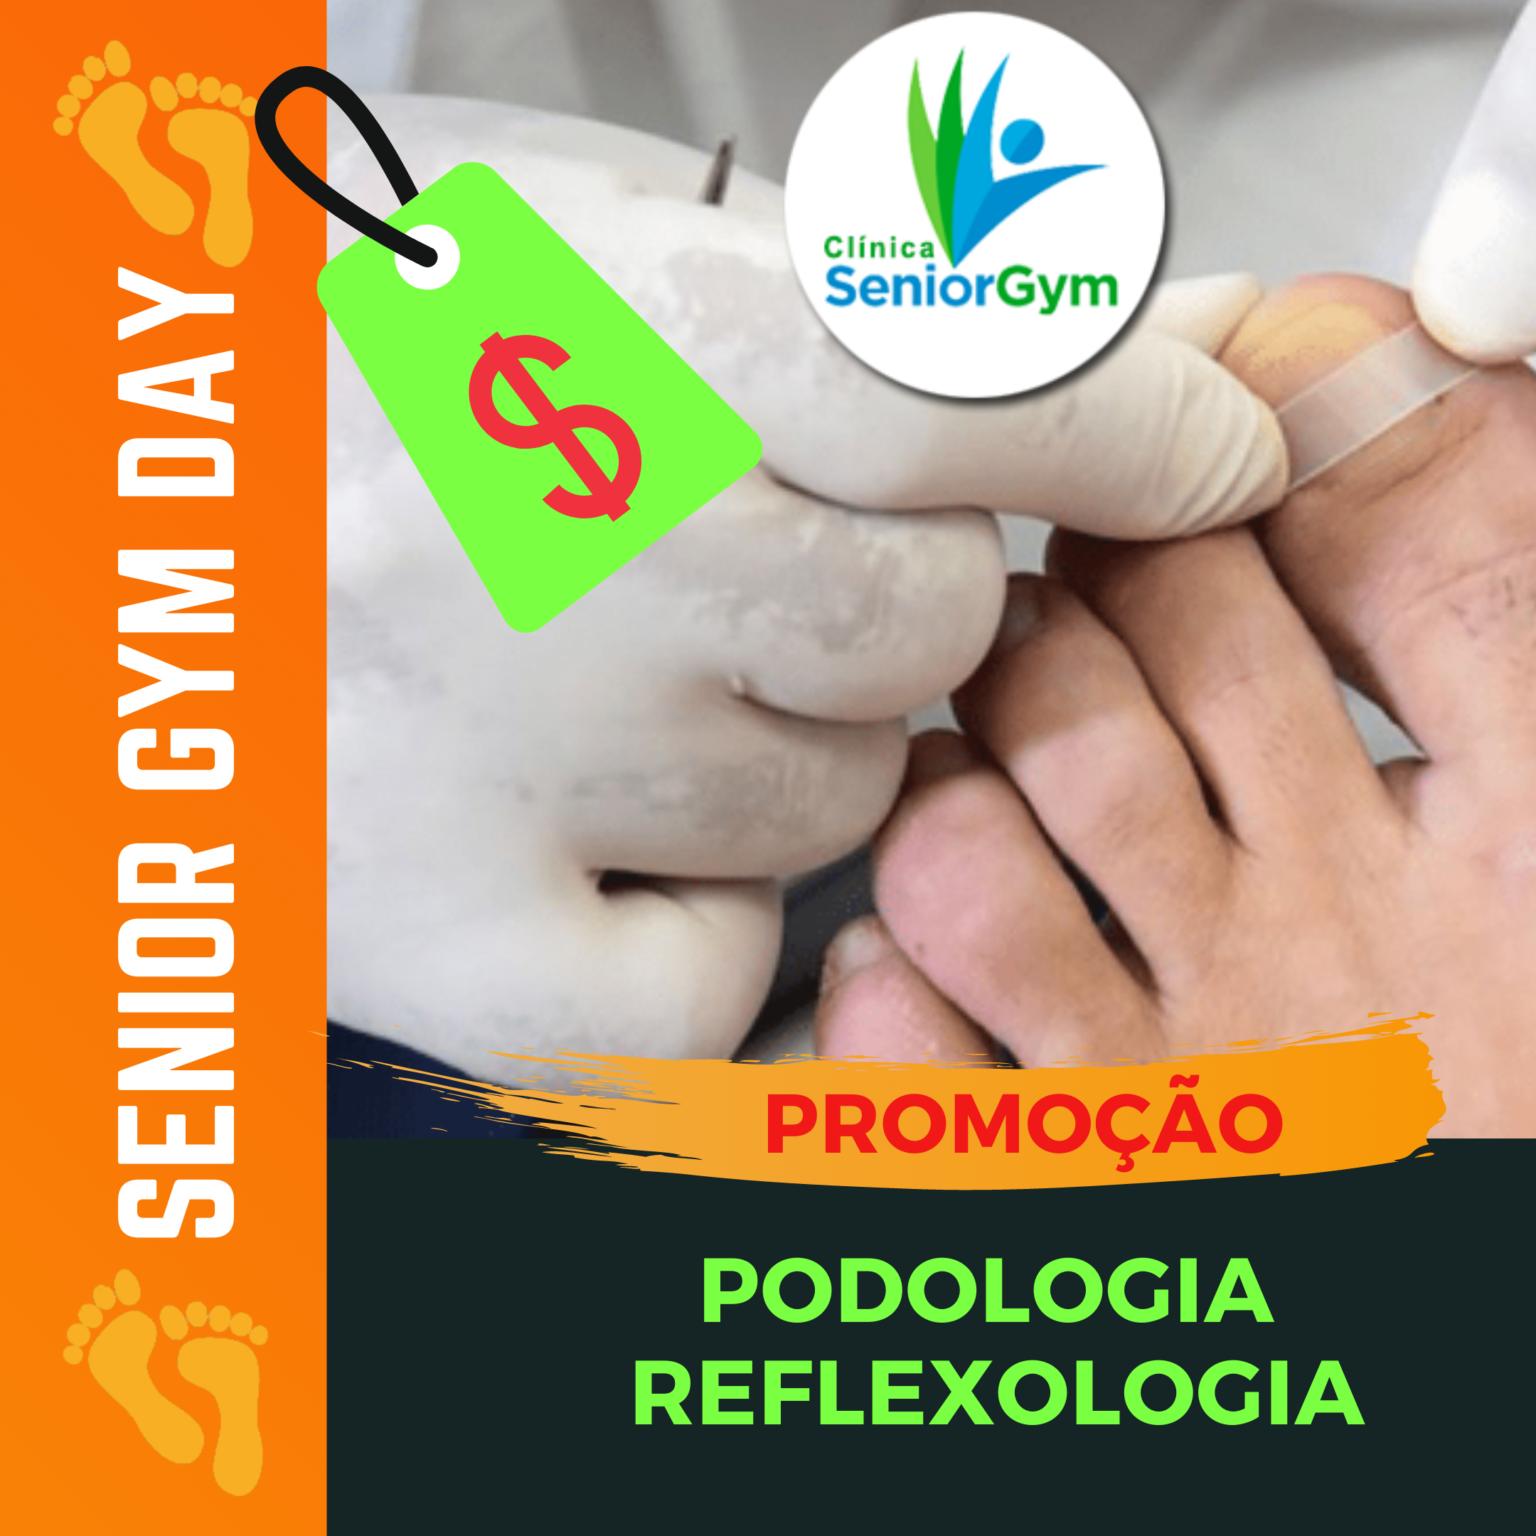 Podologia e Reflexologia